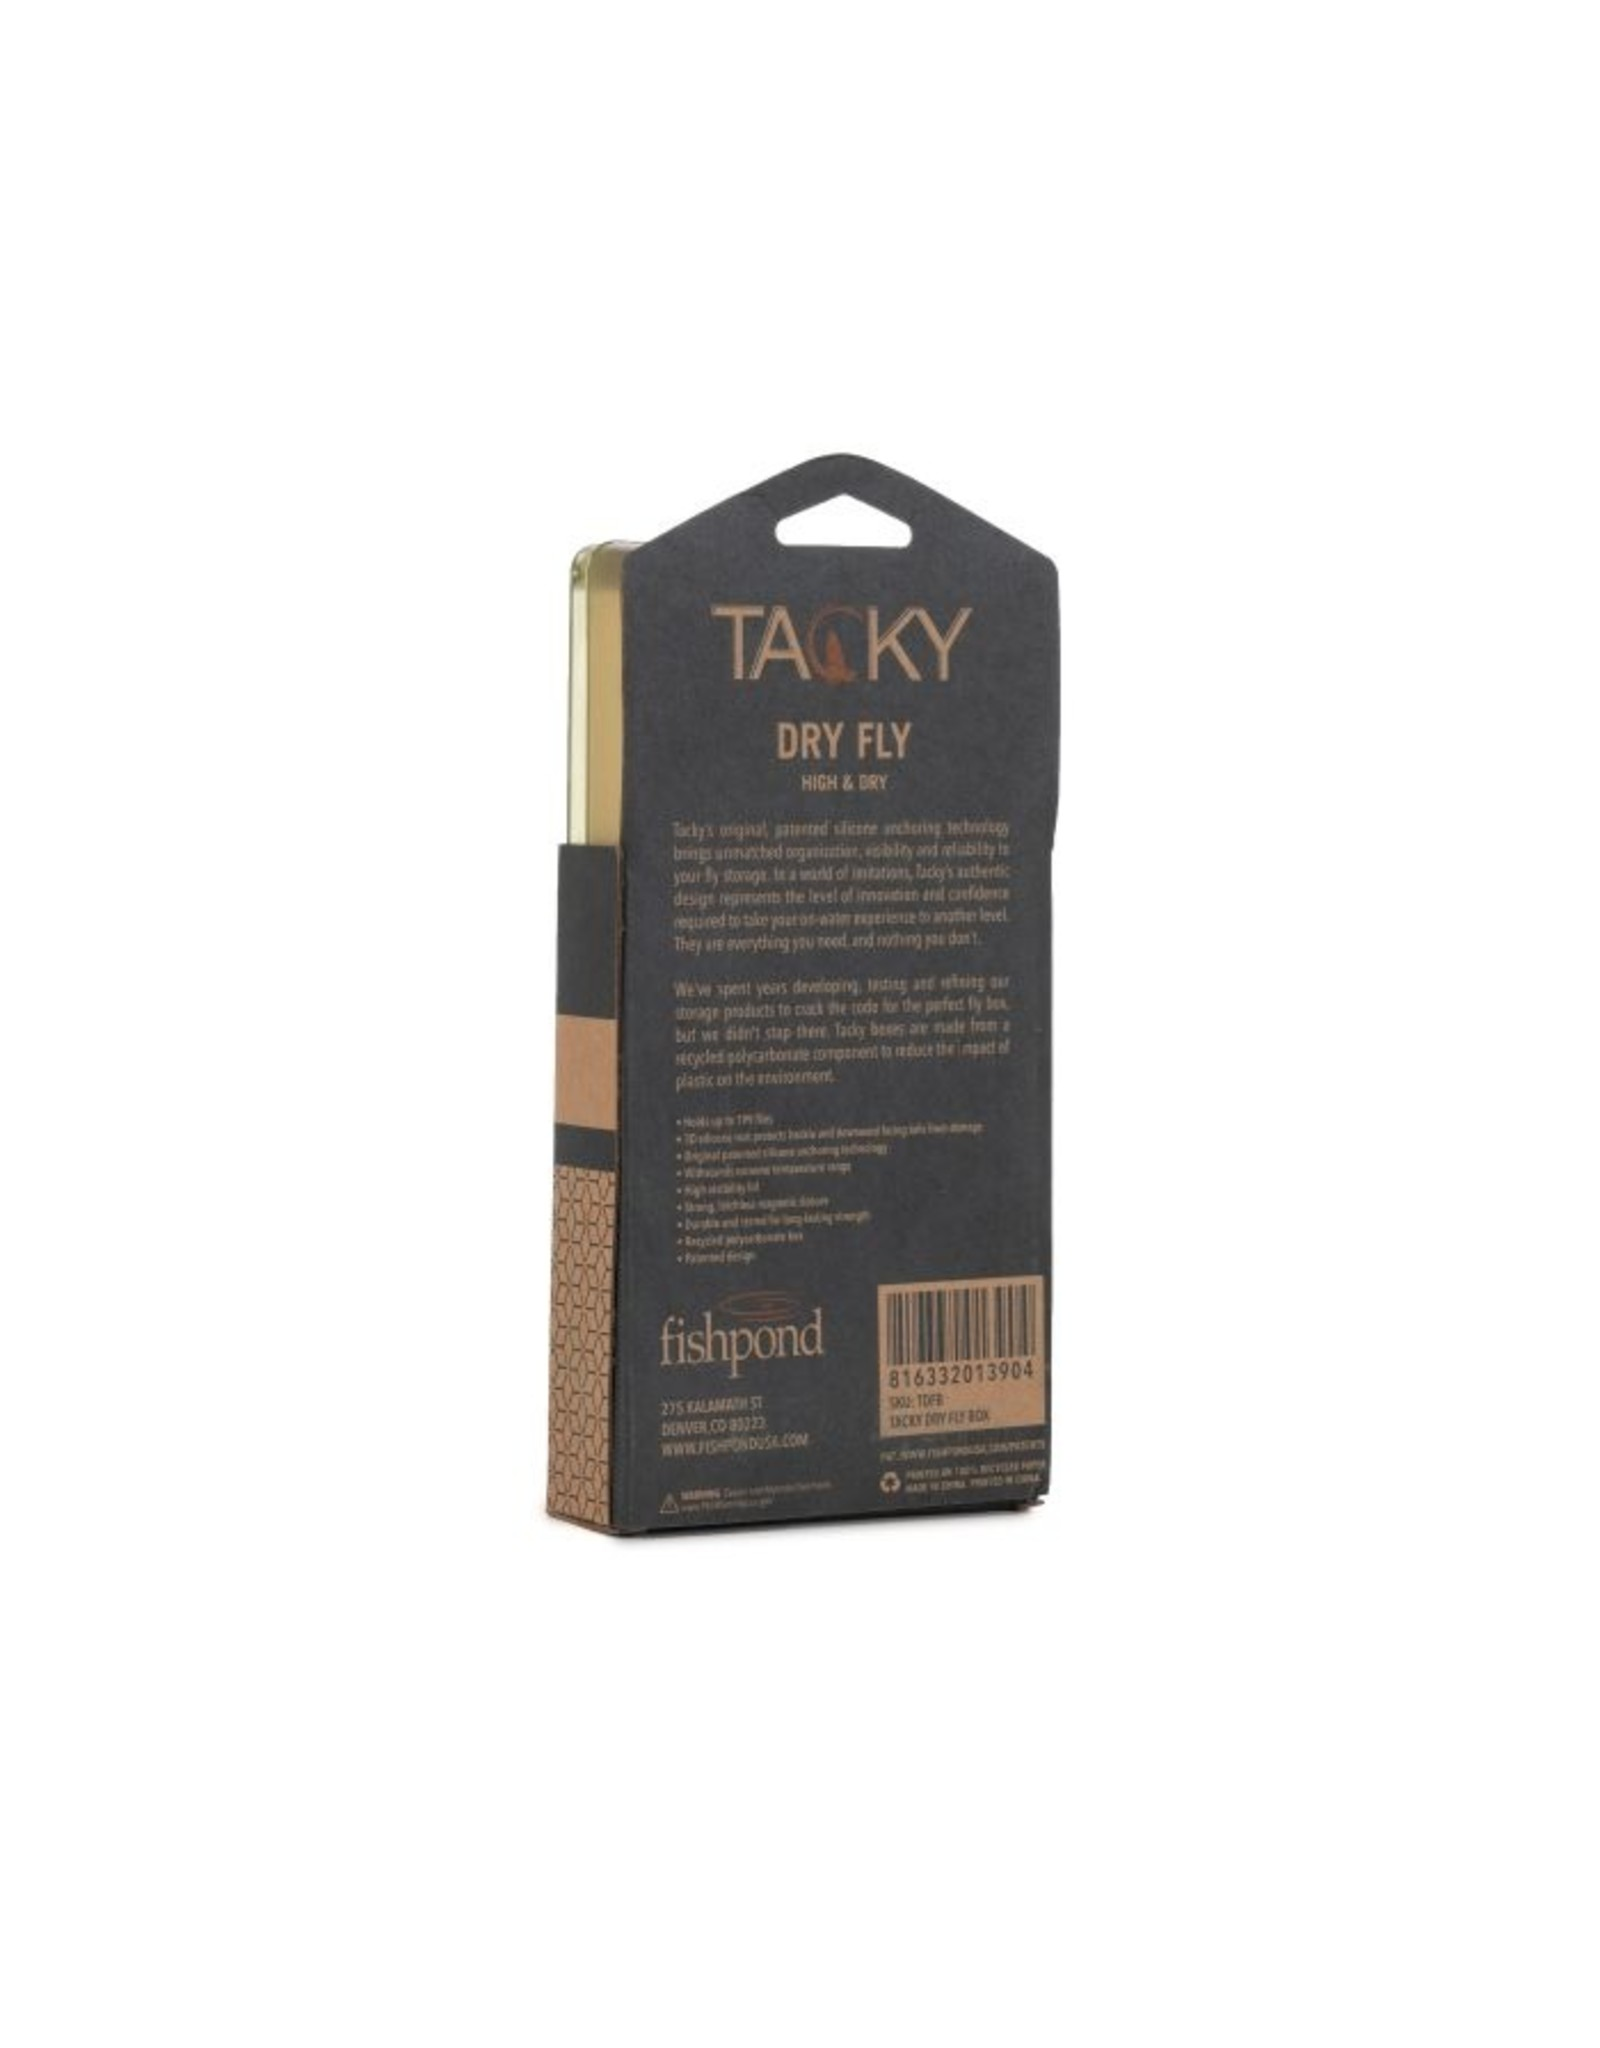 Fishpond Fishpond - Tacky Dry Fly Box